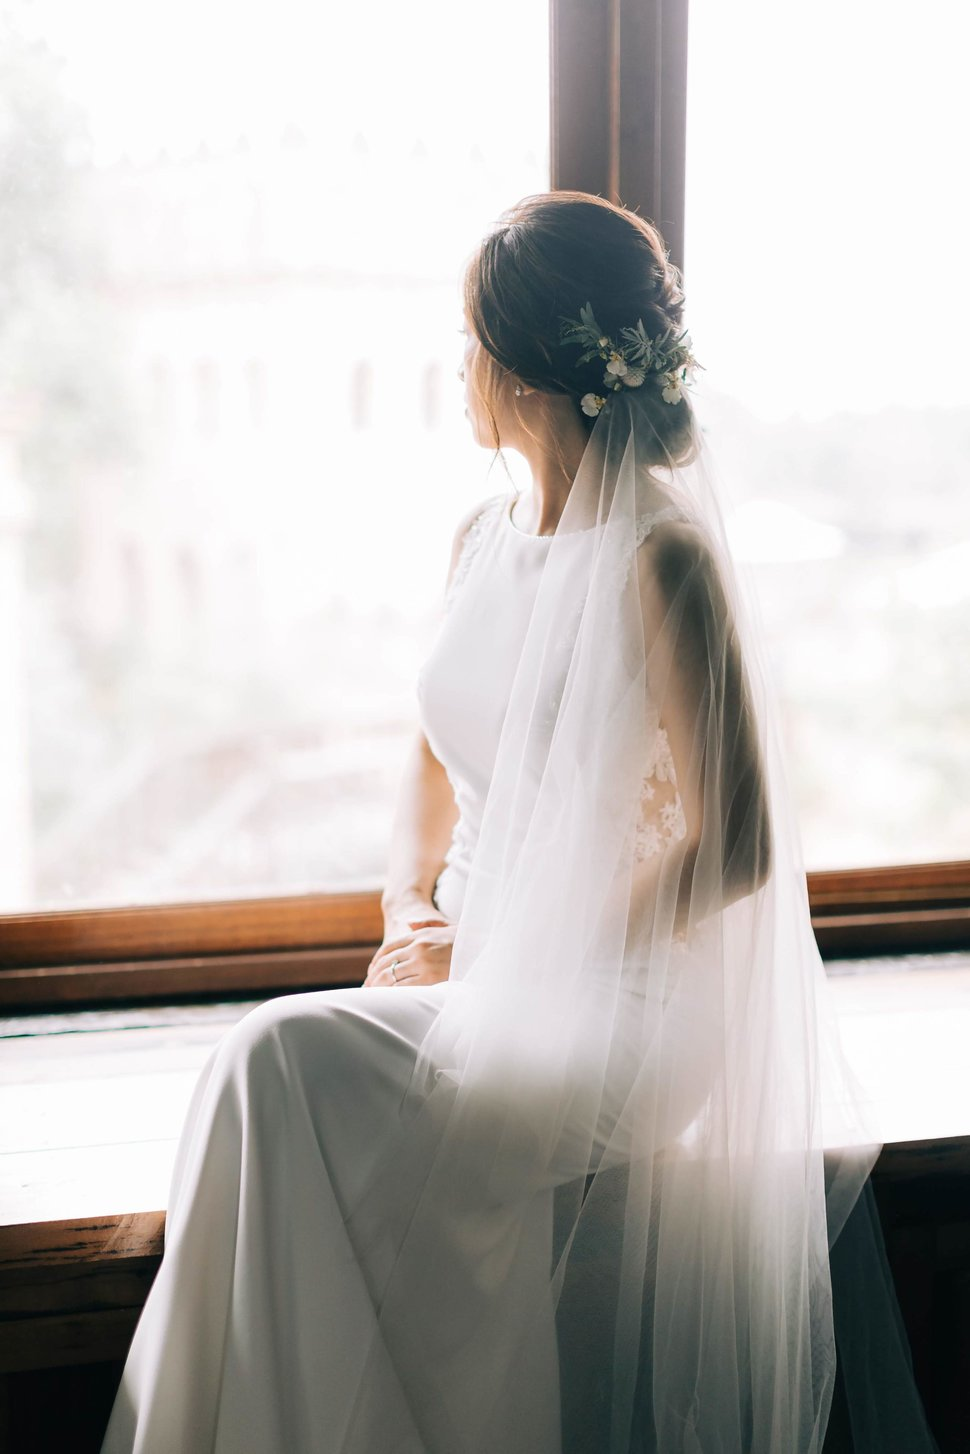 AG3_7087A - Cradle Wedding搖籃手工婚紗《結婚吧》